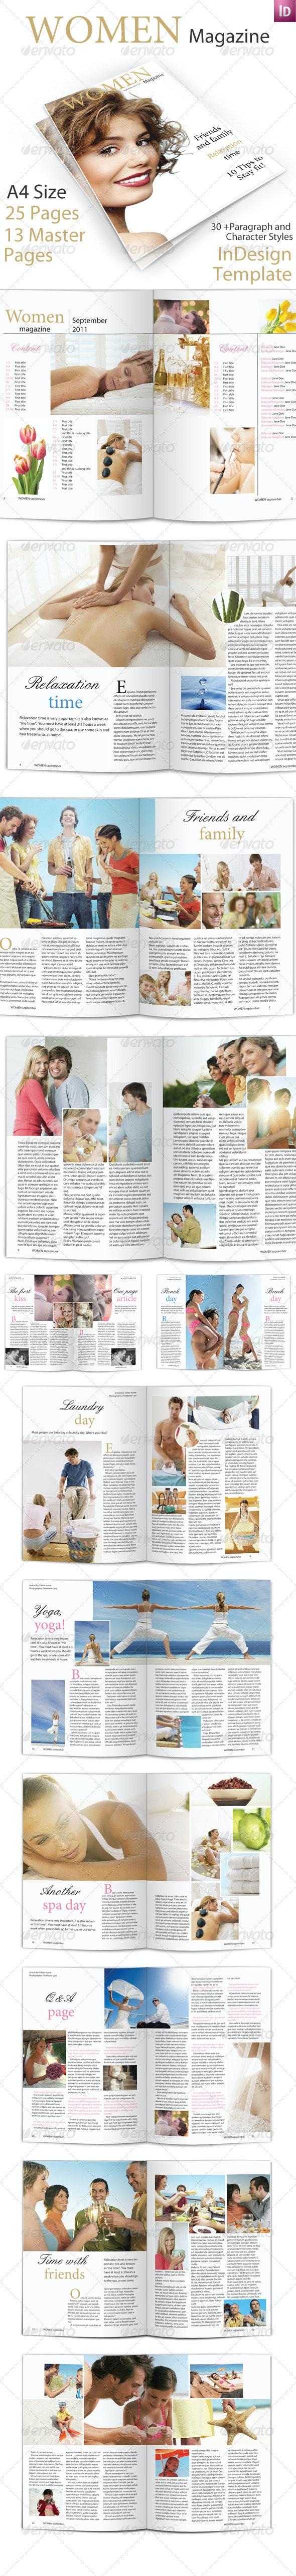 Women Magazine Template - Magazines Print Templates